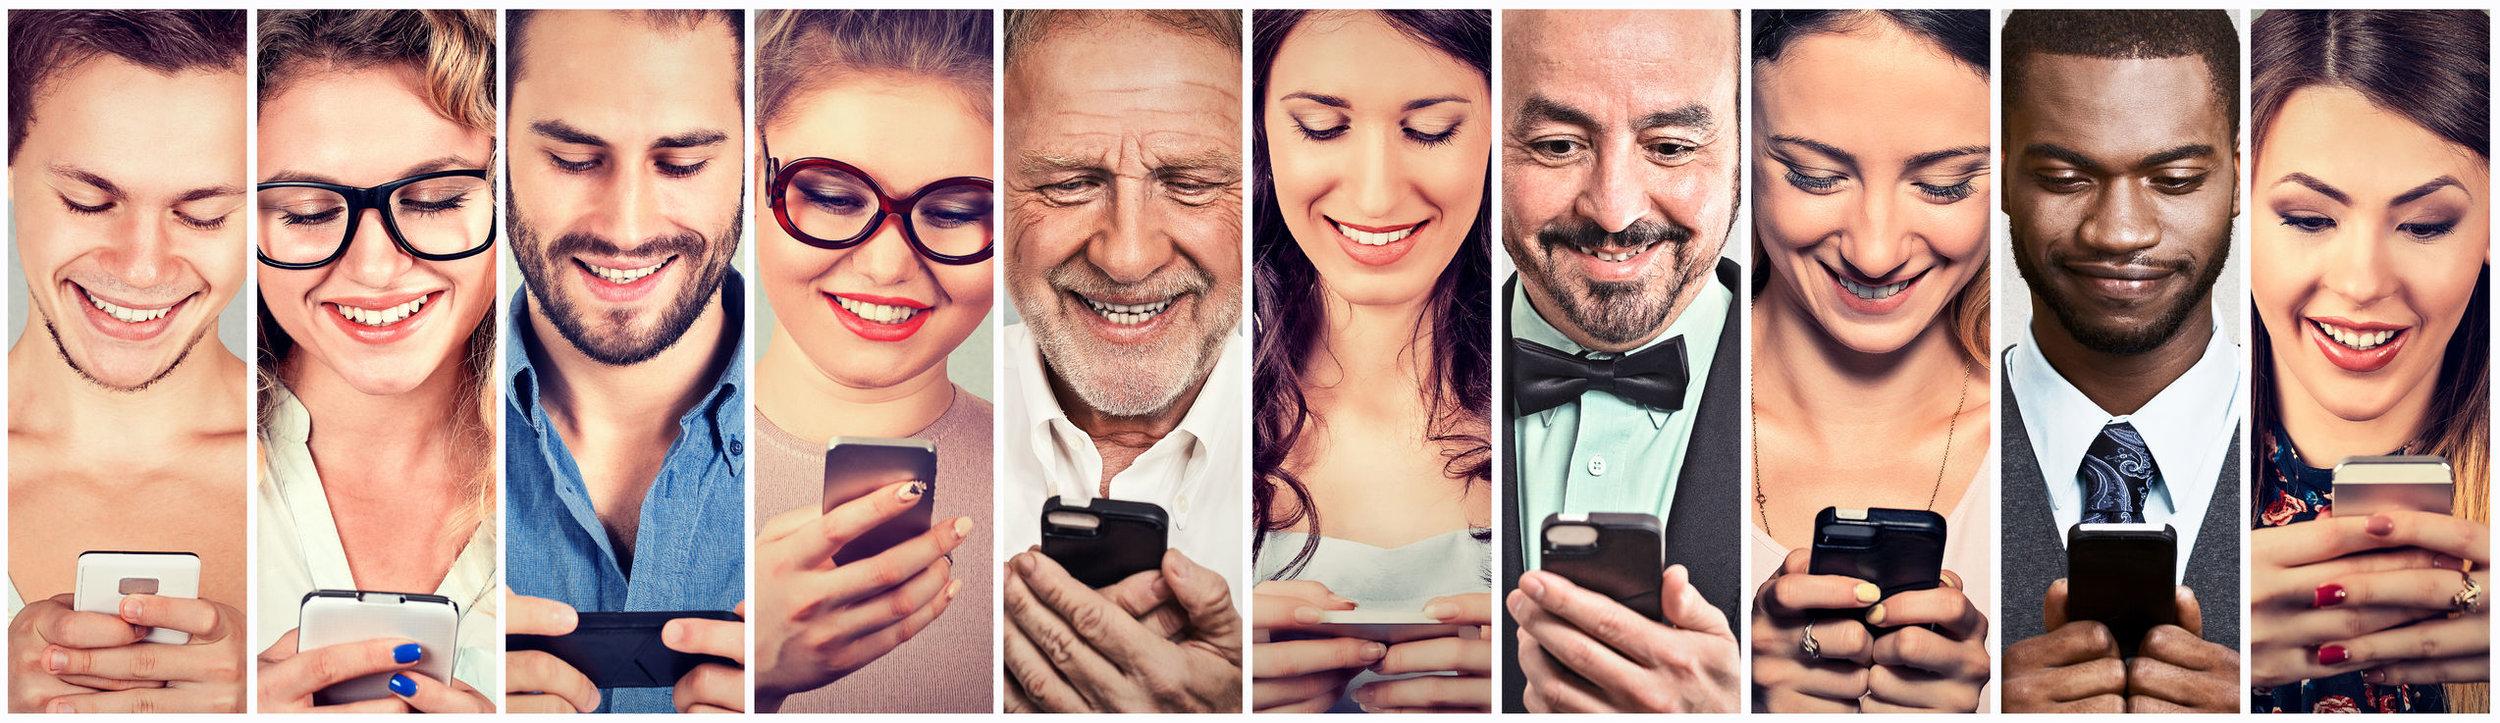 True Social Networking - 42=